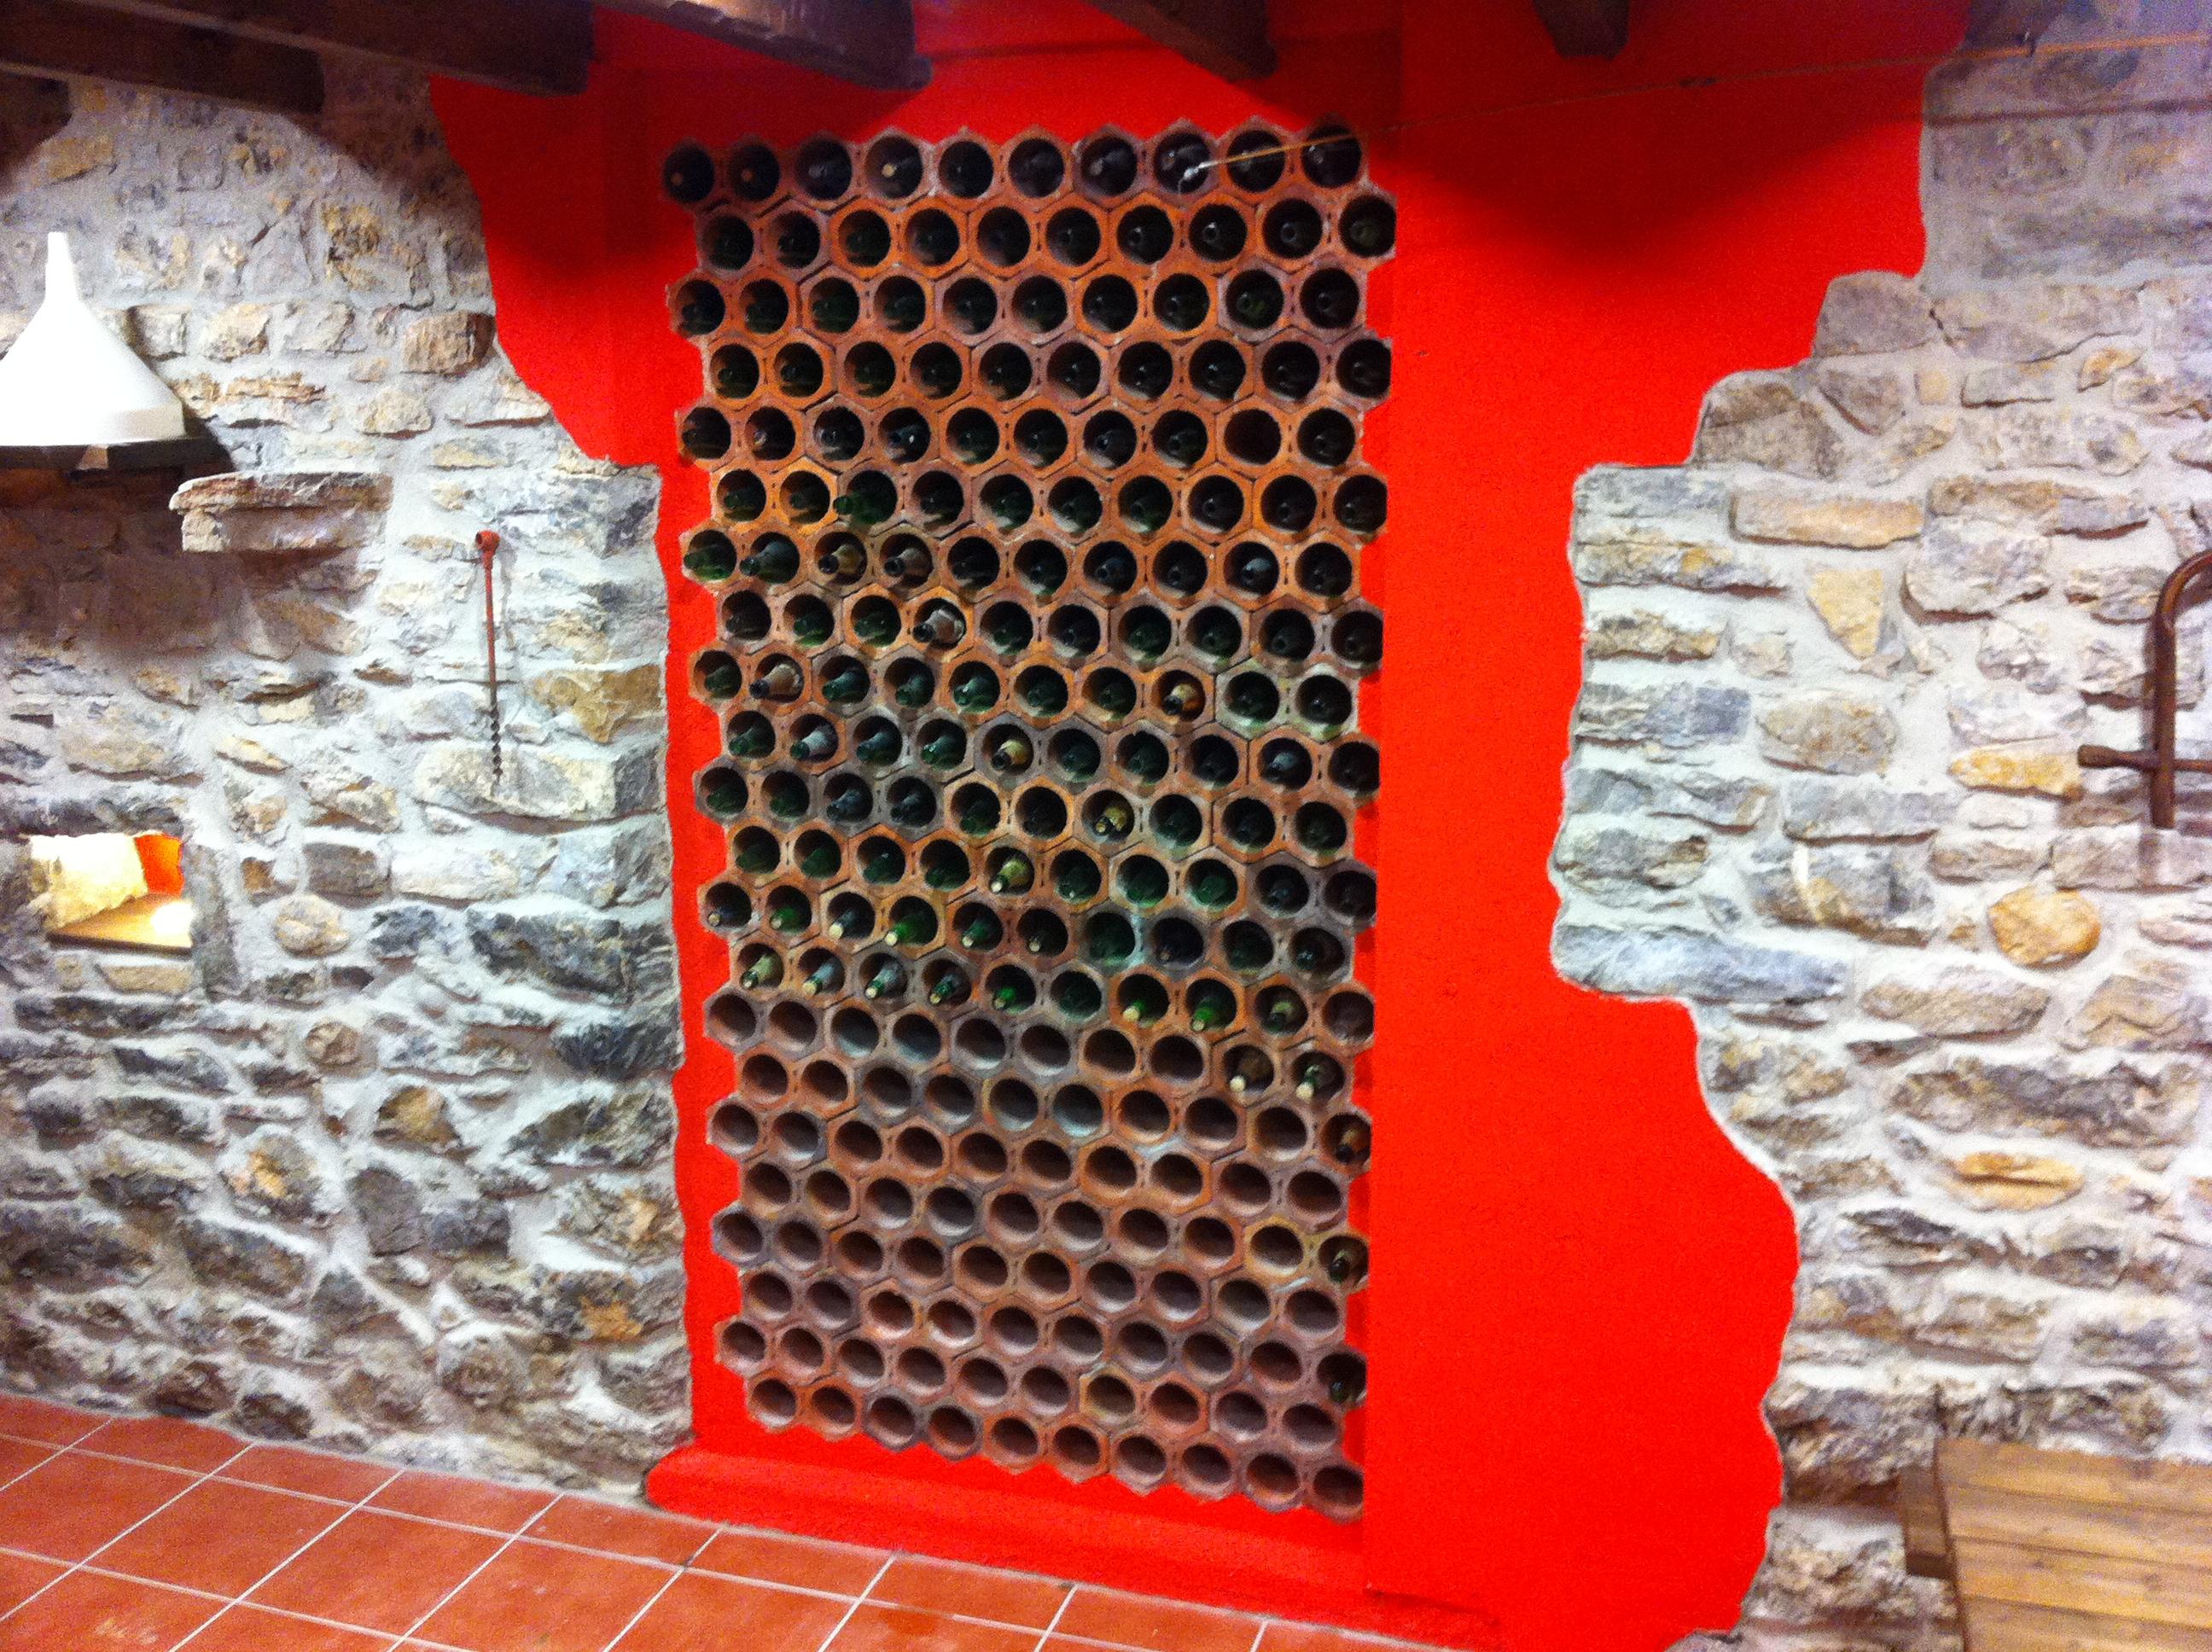 Como hacer un botellero casero awesome botelleros de palets para crear una mini bodega with - Botelleros de obra ...